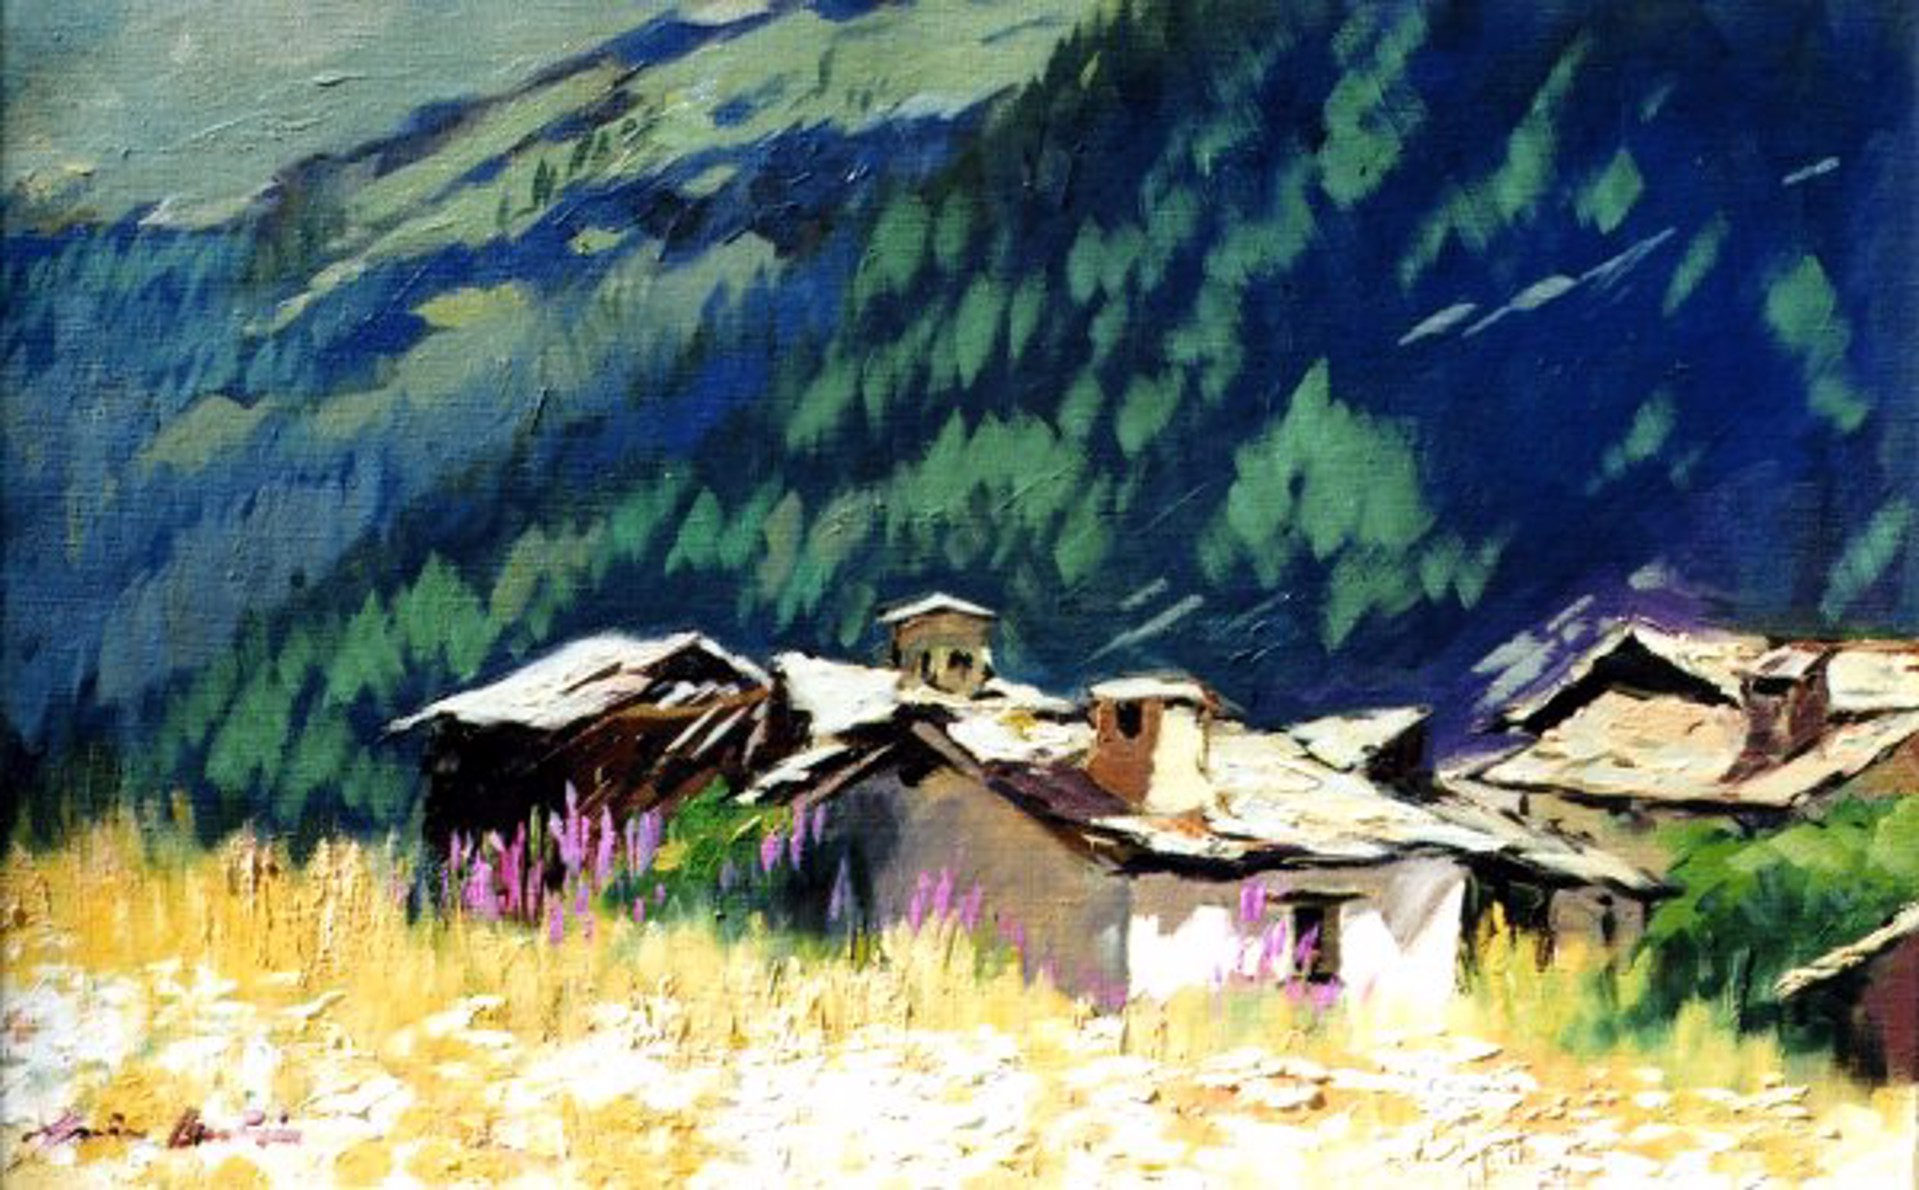 Bertran: Old Alpine Cabins by Maria Bertrán